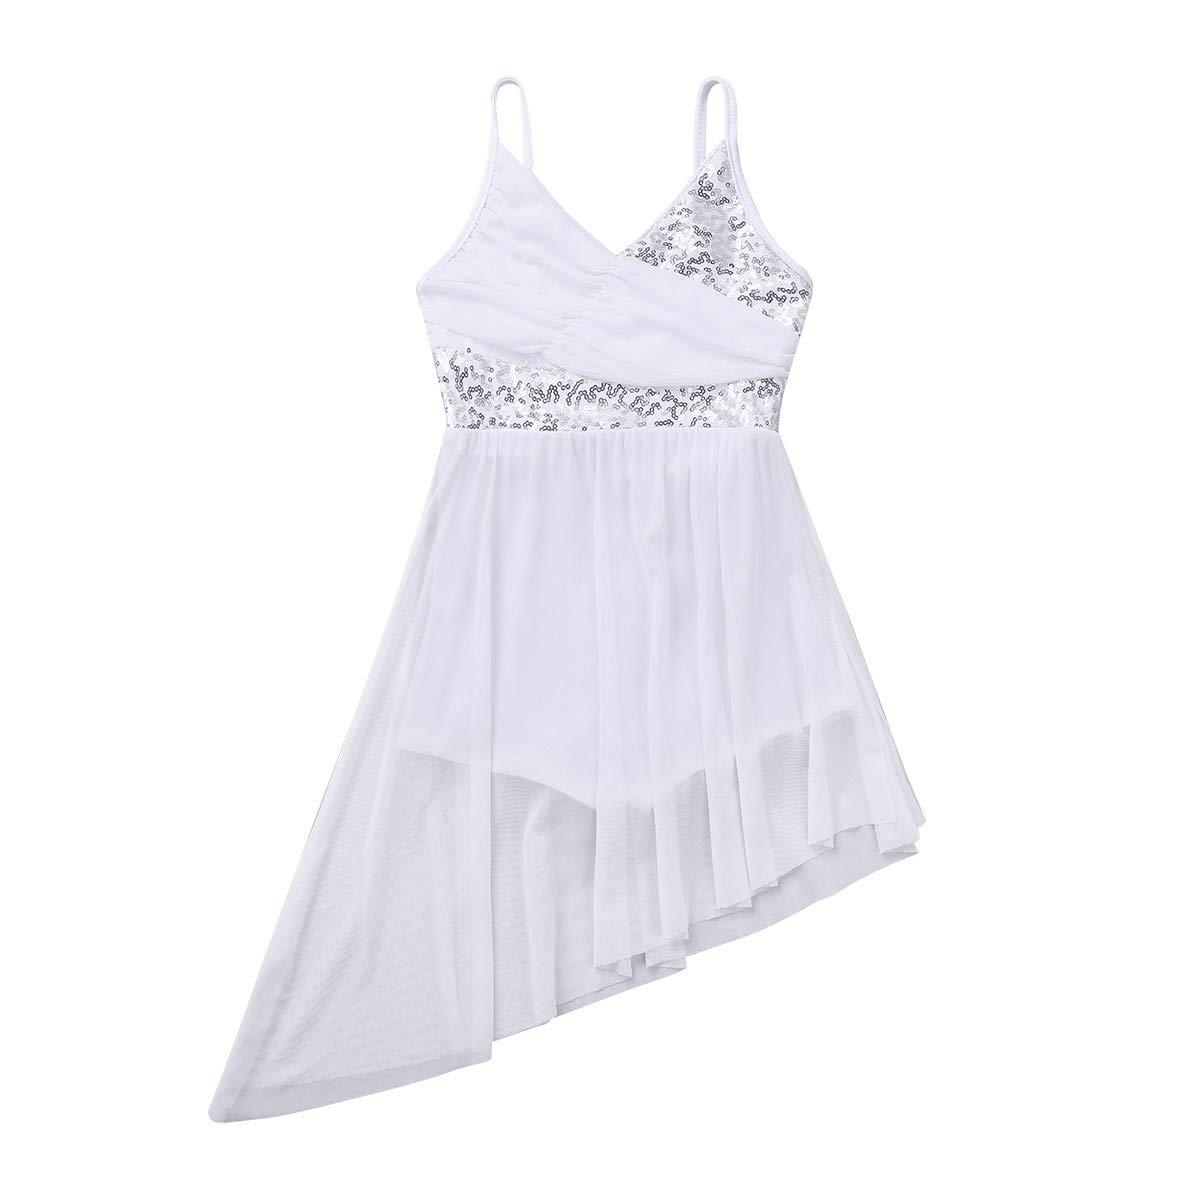 iiniim Girls V-Neck Sequined Ballet Lyrical Dance Dress Gymnastics Camisole Leotard Asymmetrical Chiffon Skirts